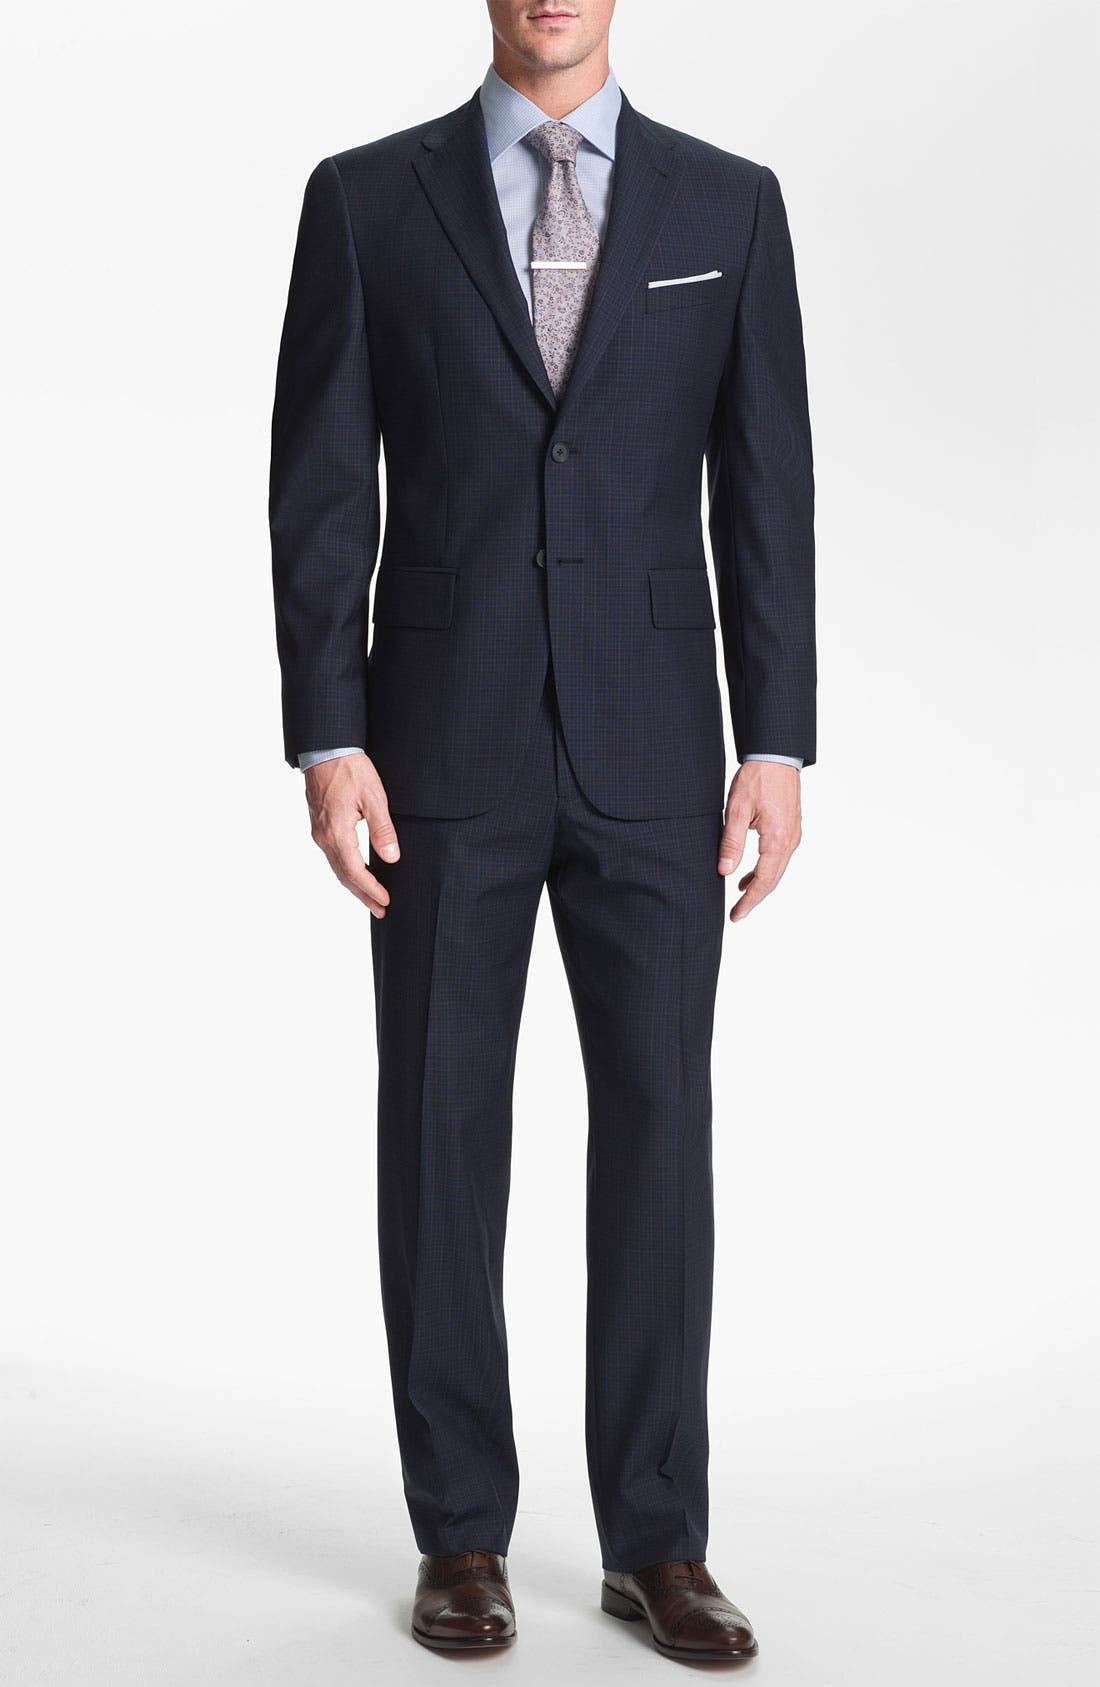 Alternate Image 1 Selected - Joseph Abboud Trim Fit Check Wool Suit